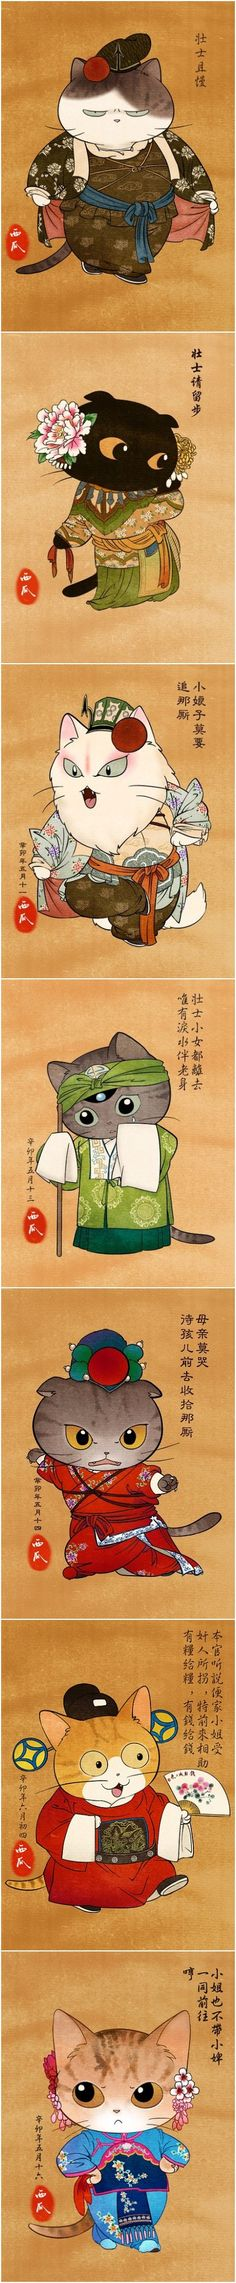 Sooooo cute, kitties in traditional Chinese opera costums...XD